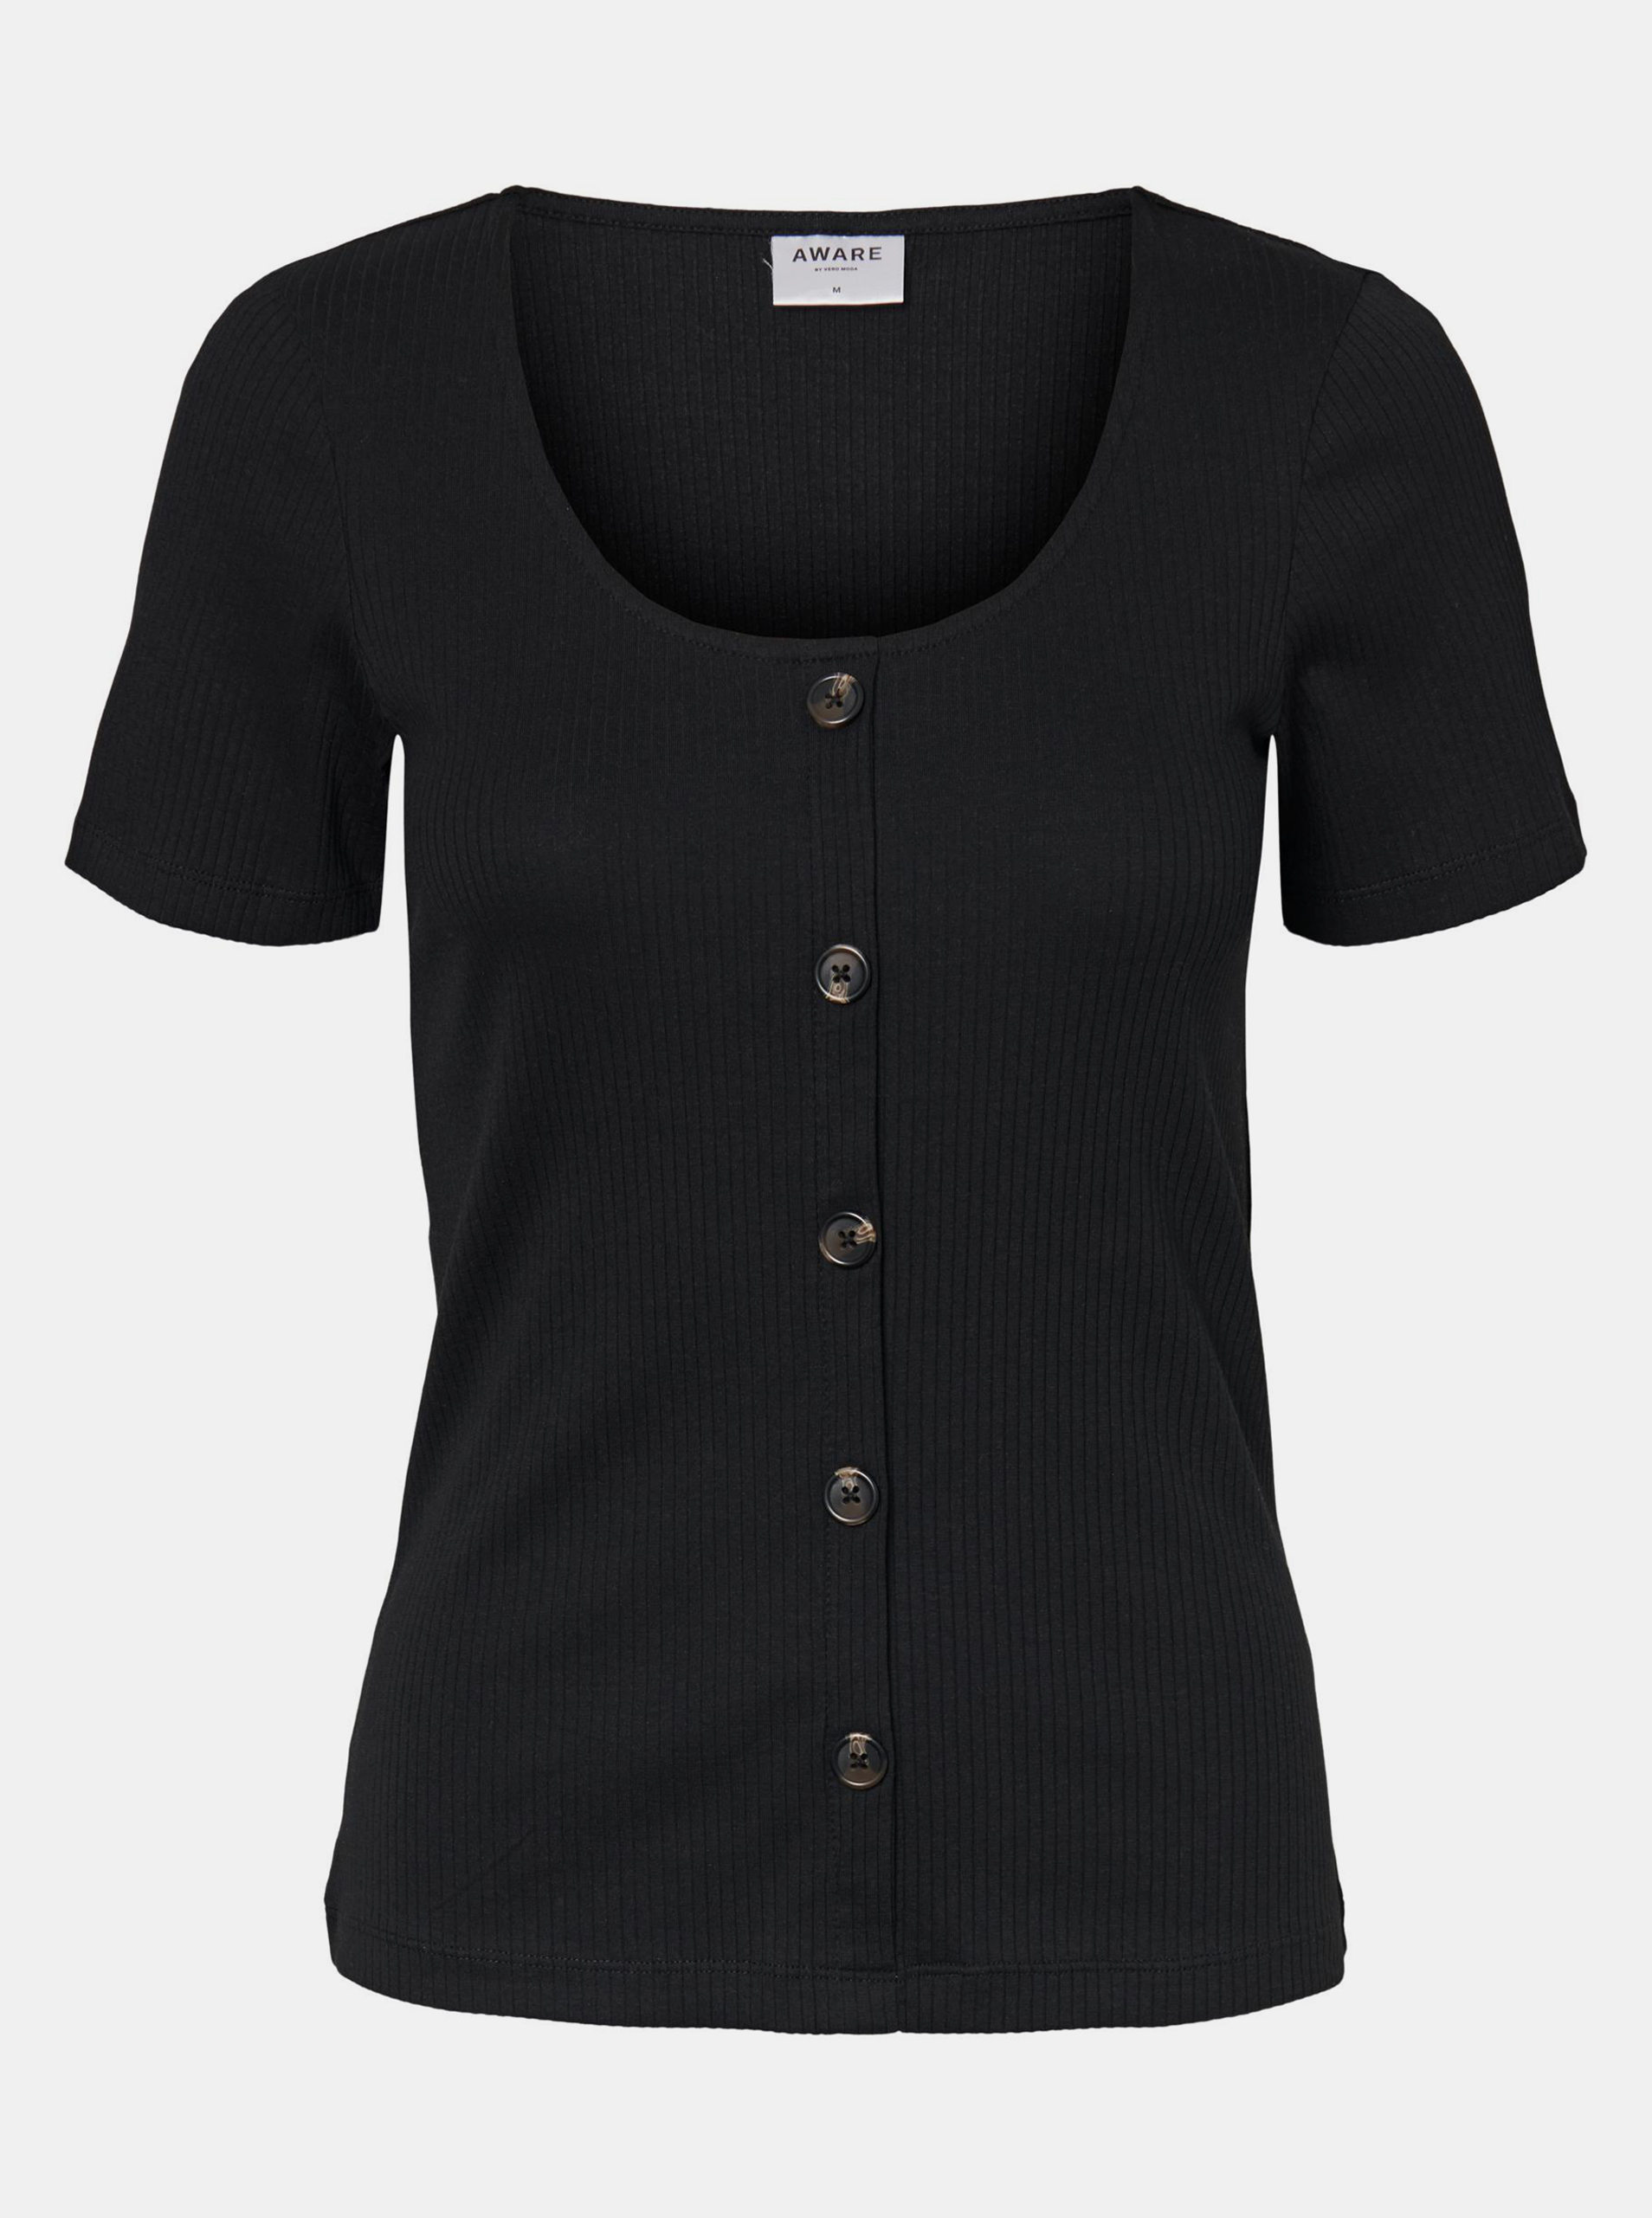 Vero Moda czarny koszulka Helsinki